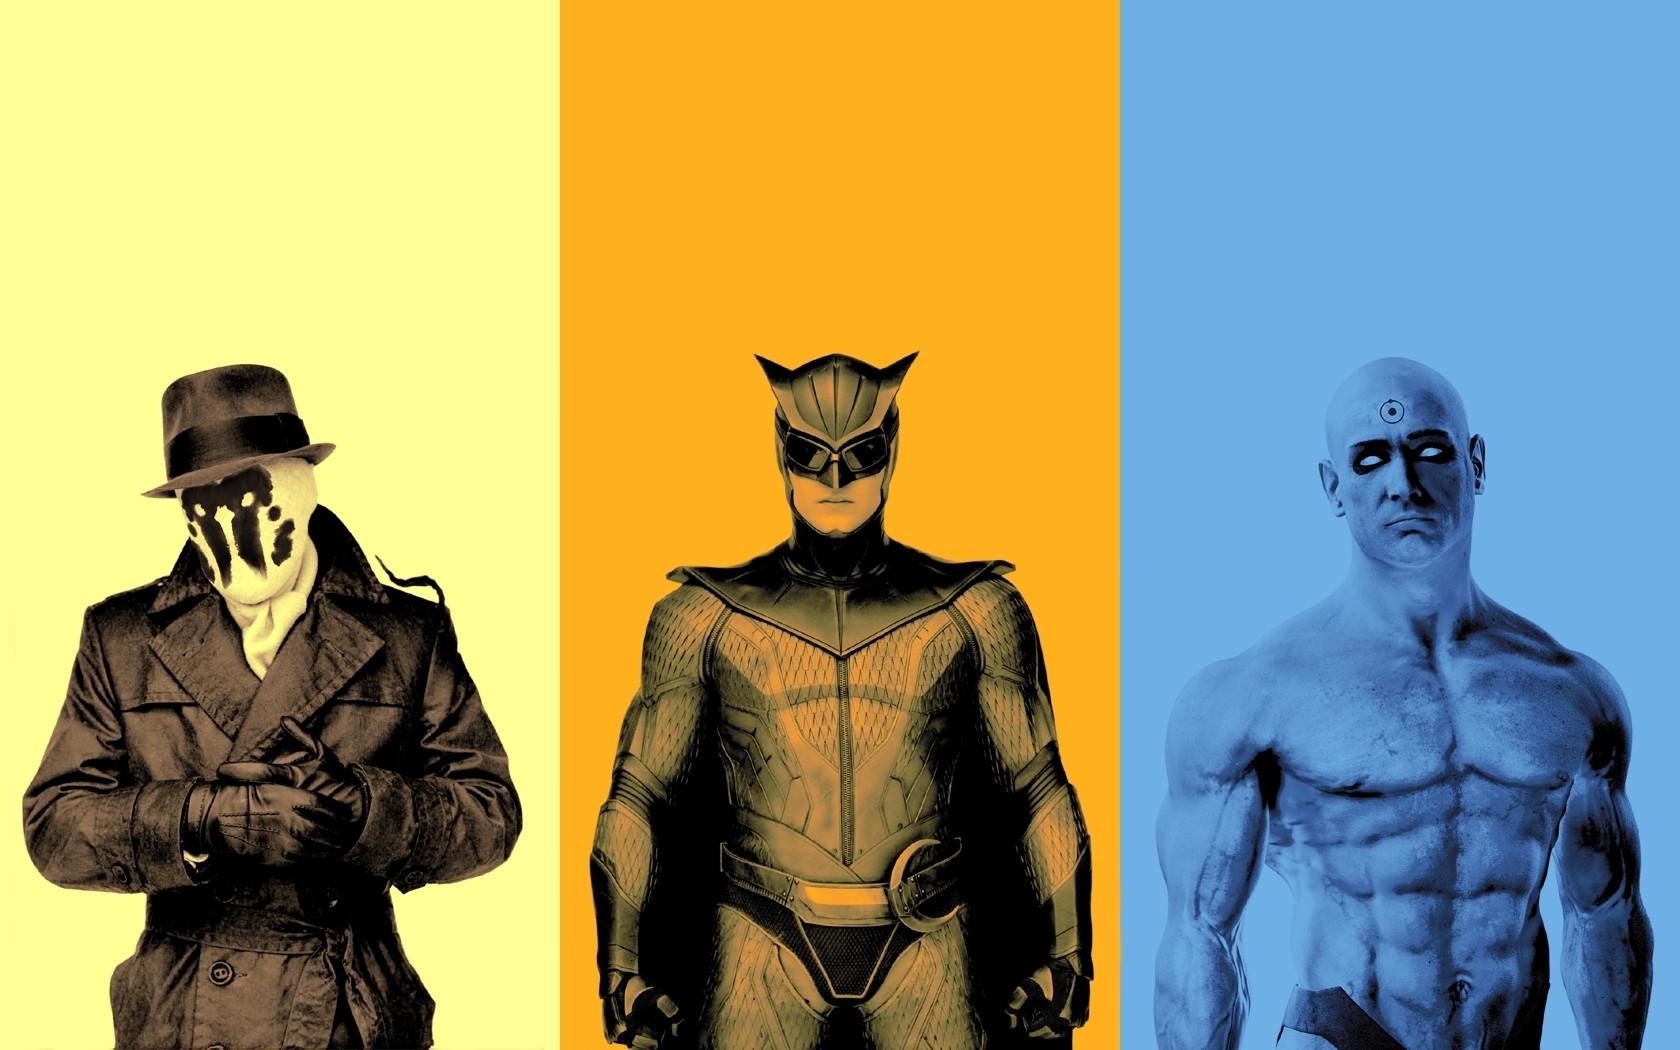 Wallpaper Illustration Collage Movies Cartoon Superhero Comics Watchmen Rorschach Dr Manhattan Nite Owl Screenshot 1680x1050 Cirit 212751 Hd Wallpapers Wallhere